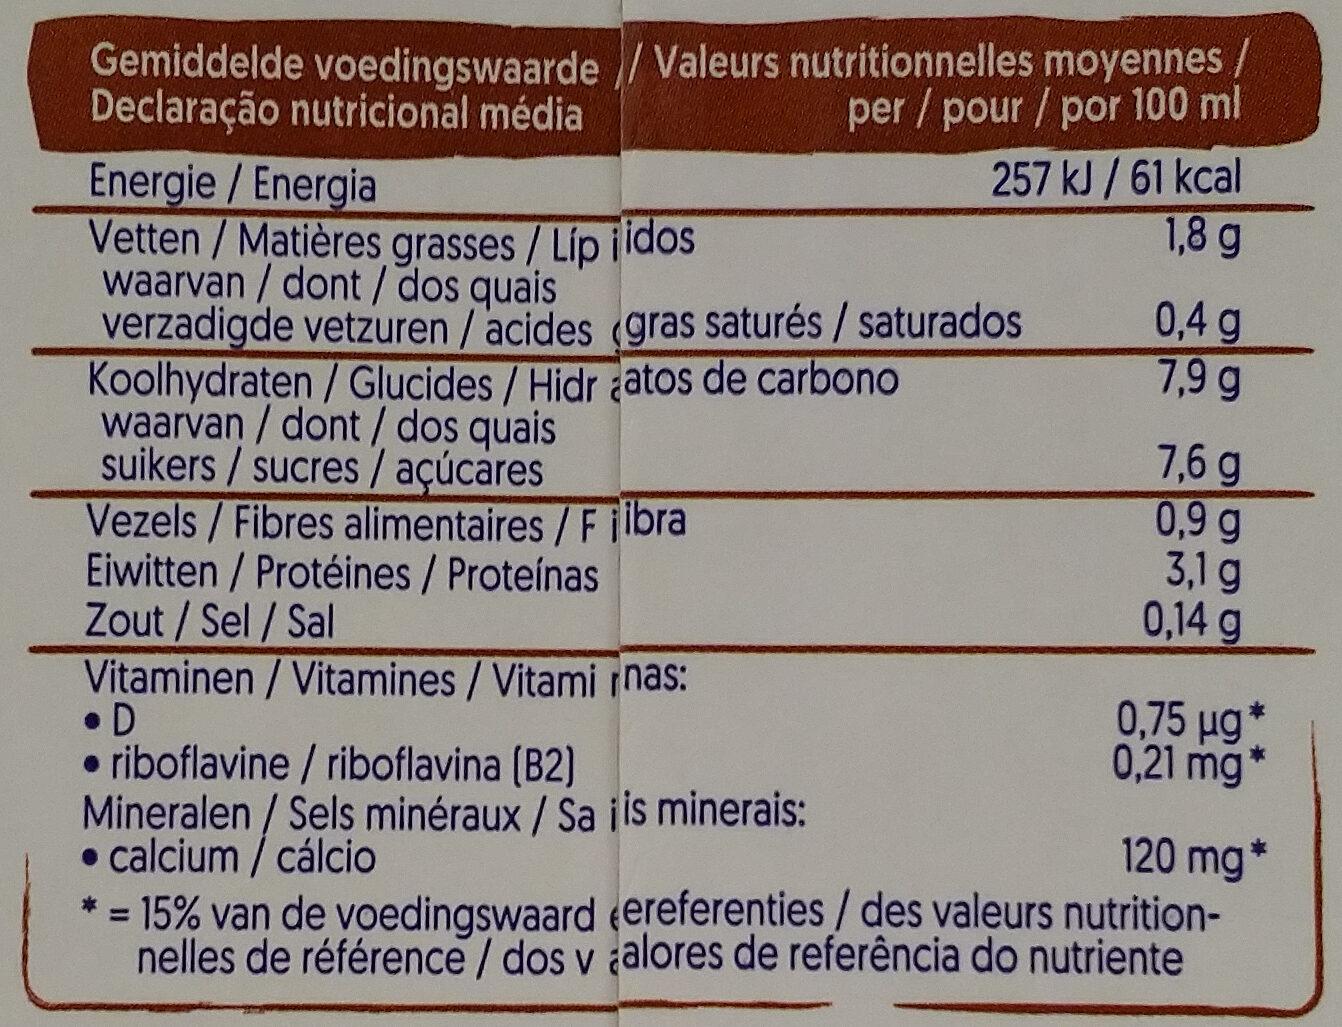 Soja saveur chocolat - Informations nutritionnelles - fr